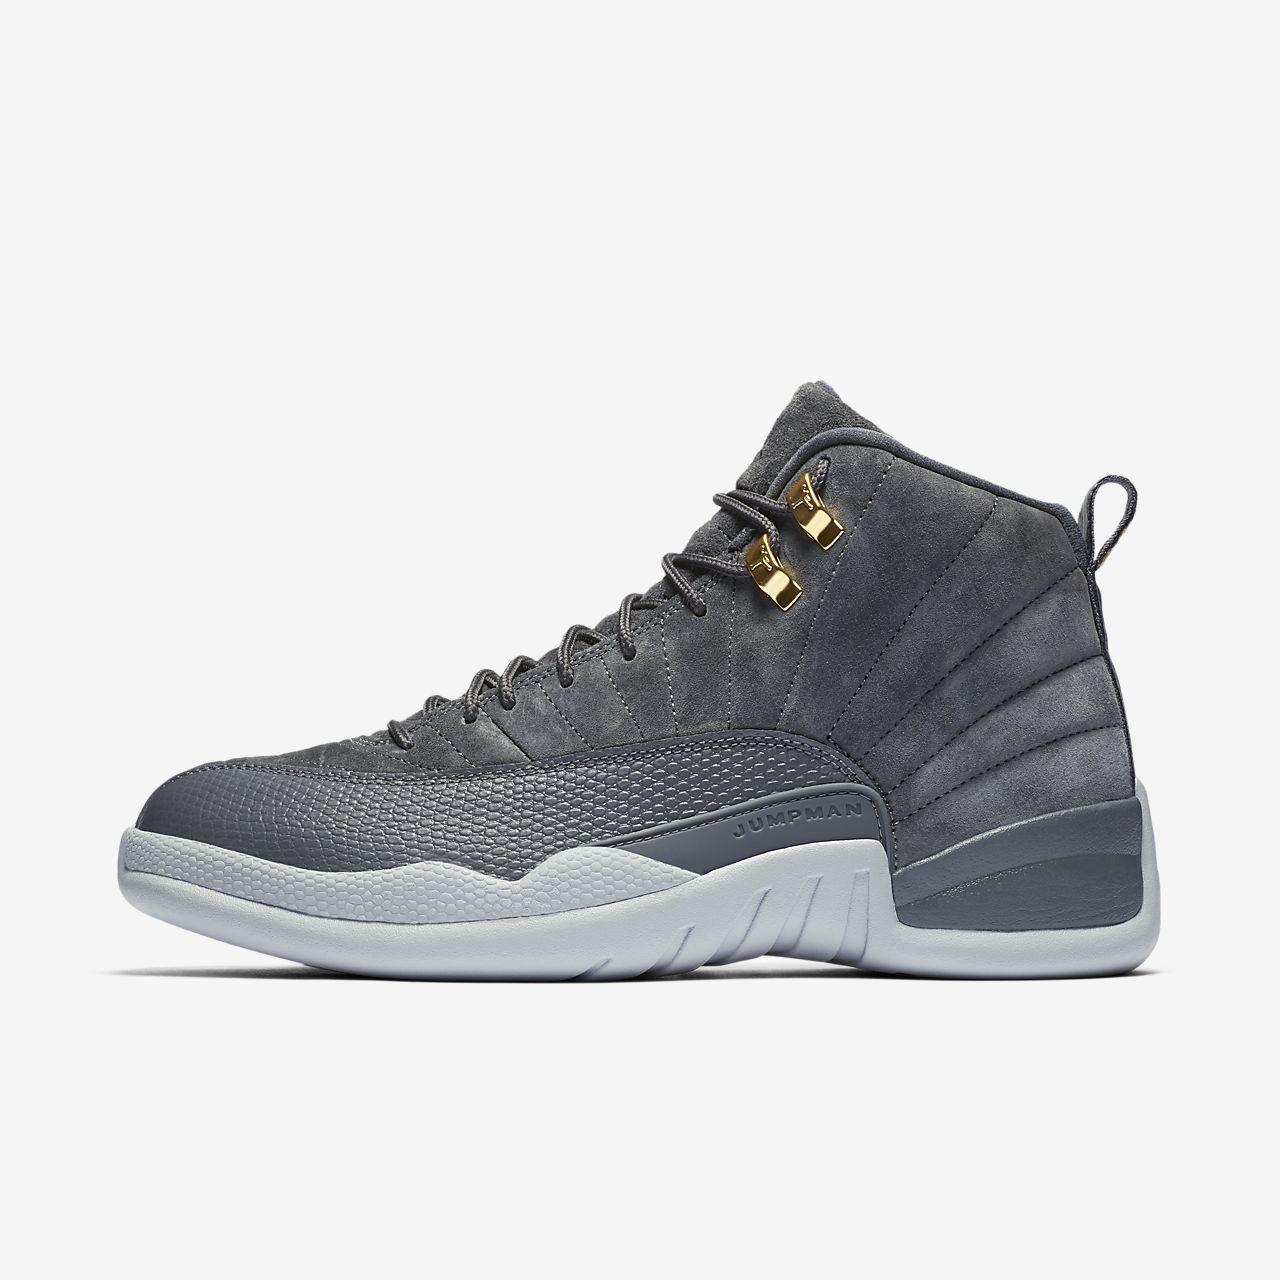 Air Jordan 12 Retro Men's Shoe   Air jordans, Retro shoes, Nike ...